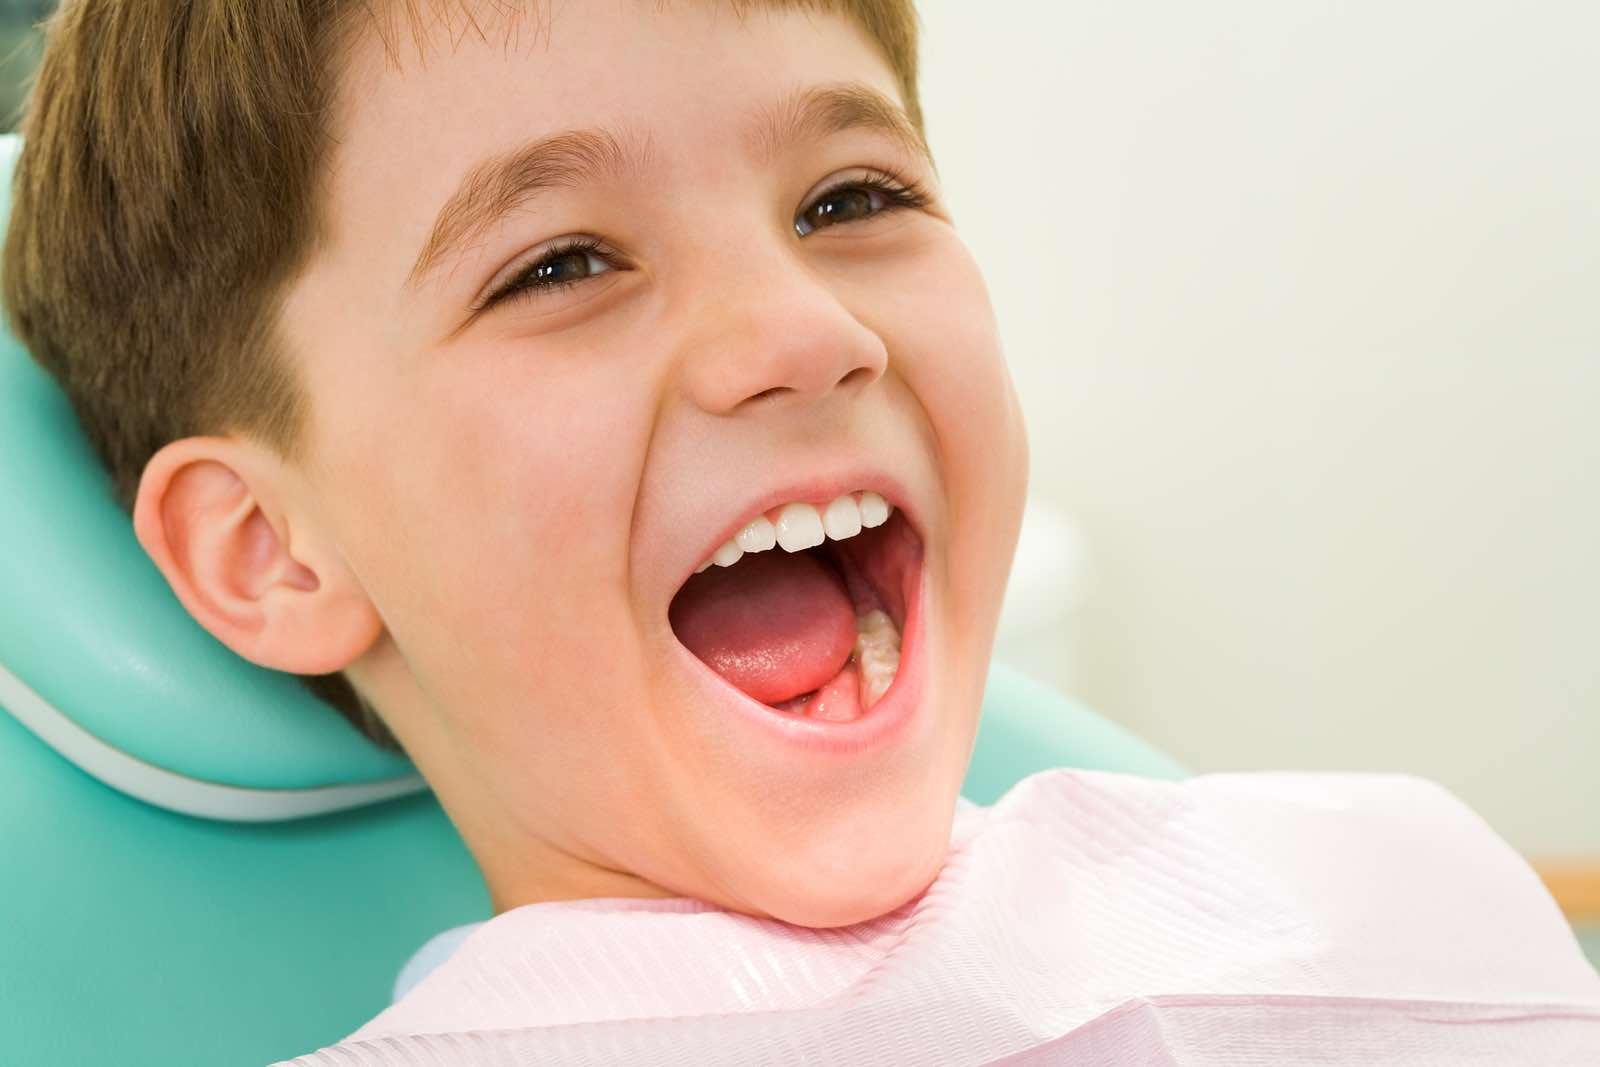 Kid at dental office. Bellaire dentist